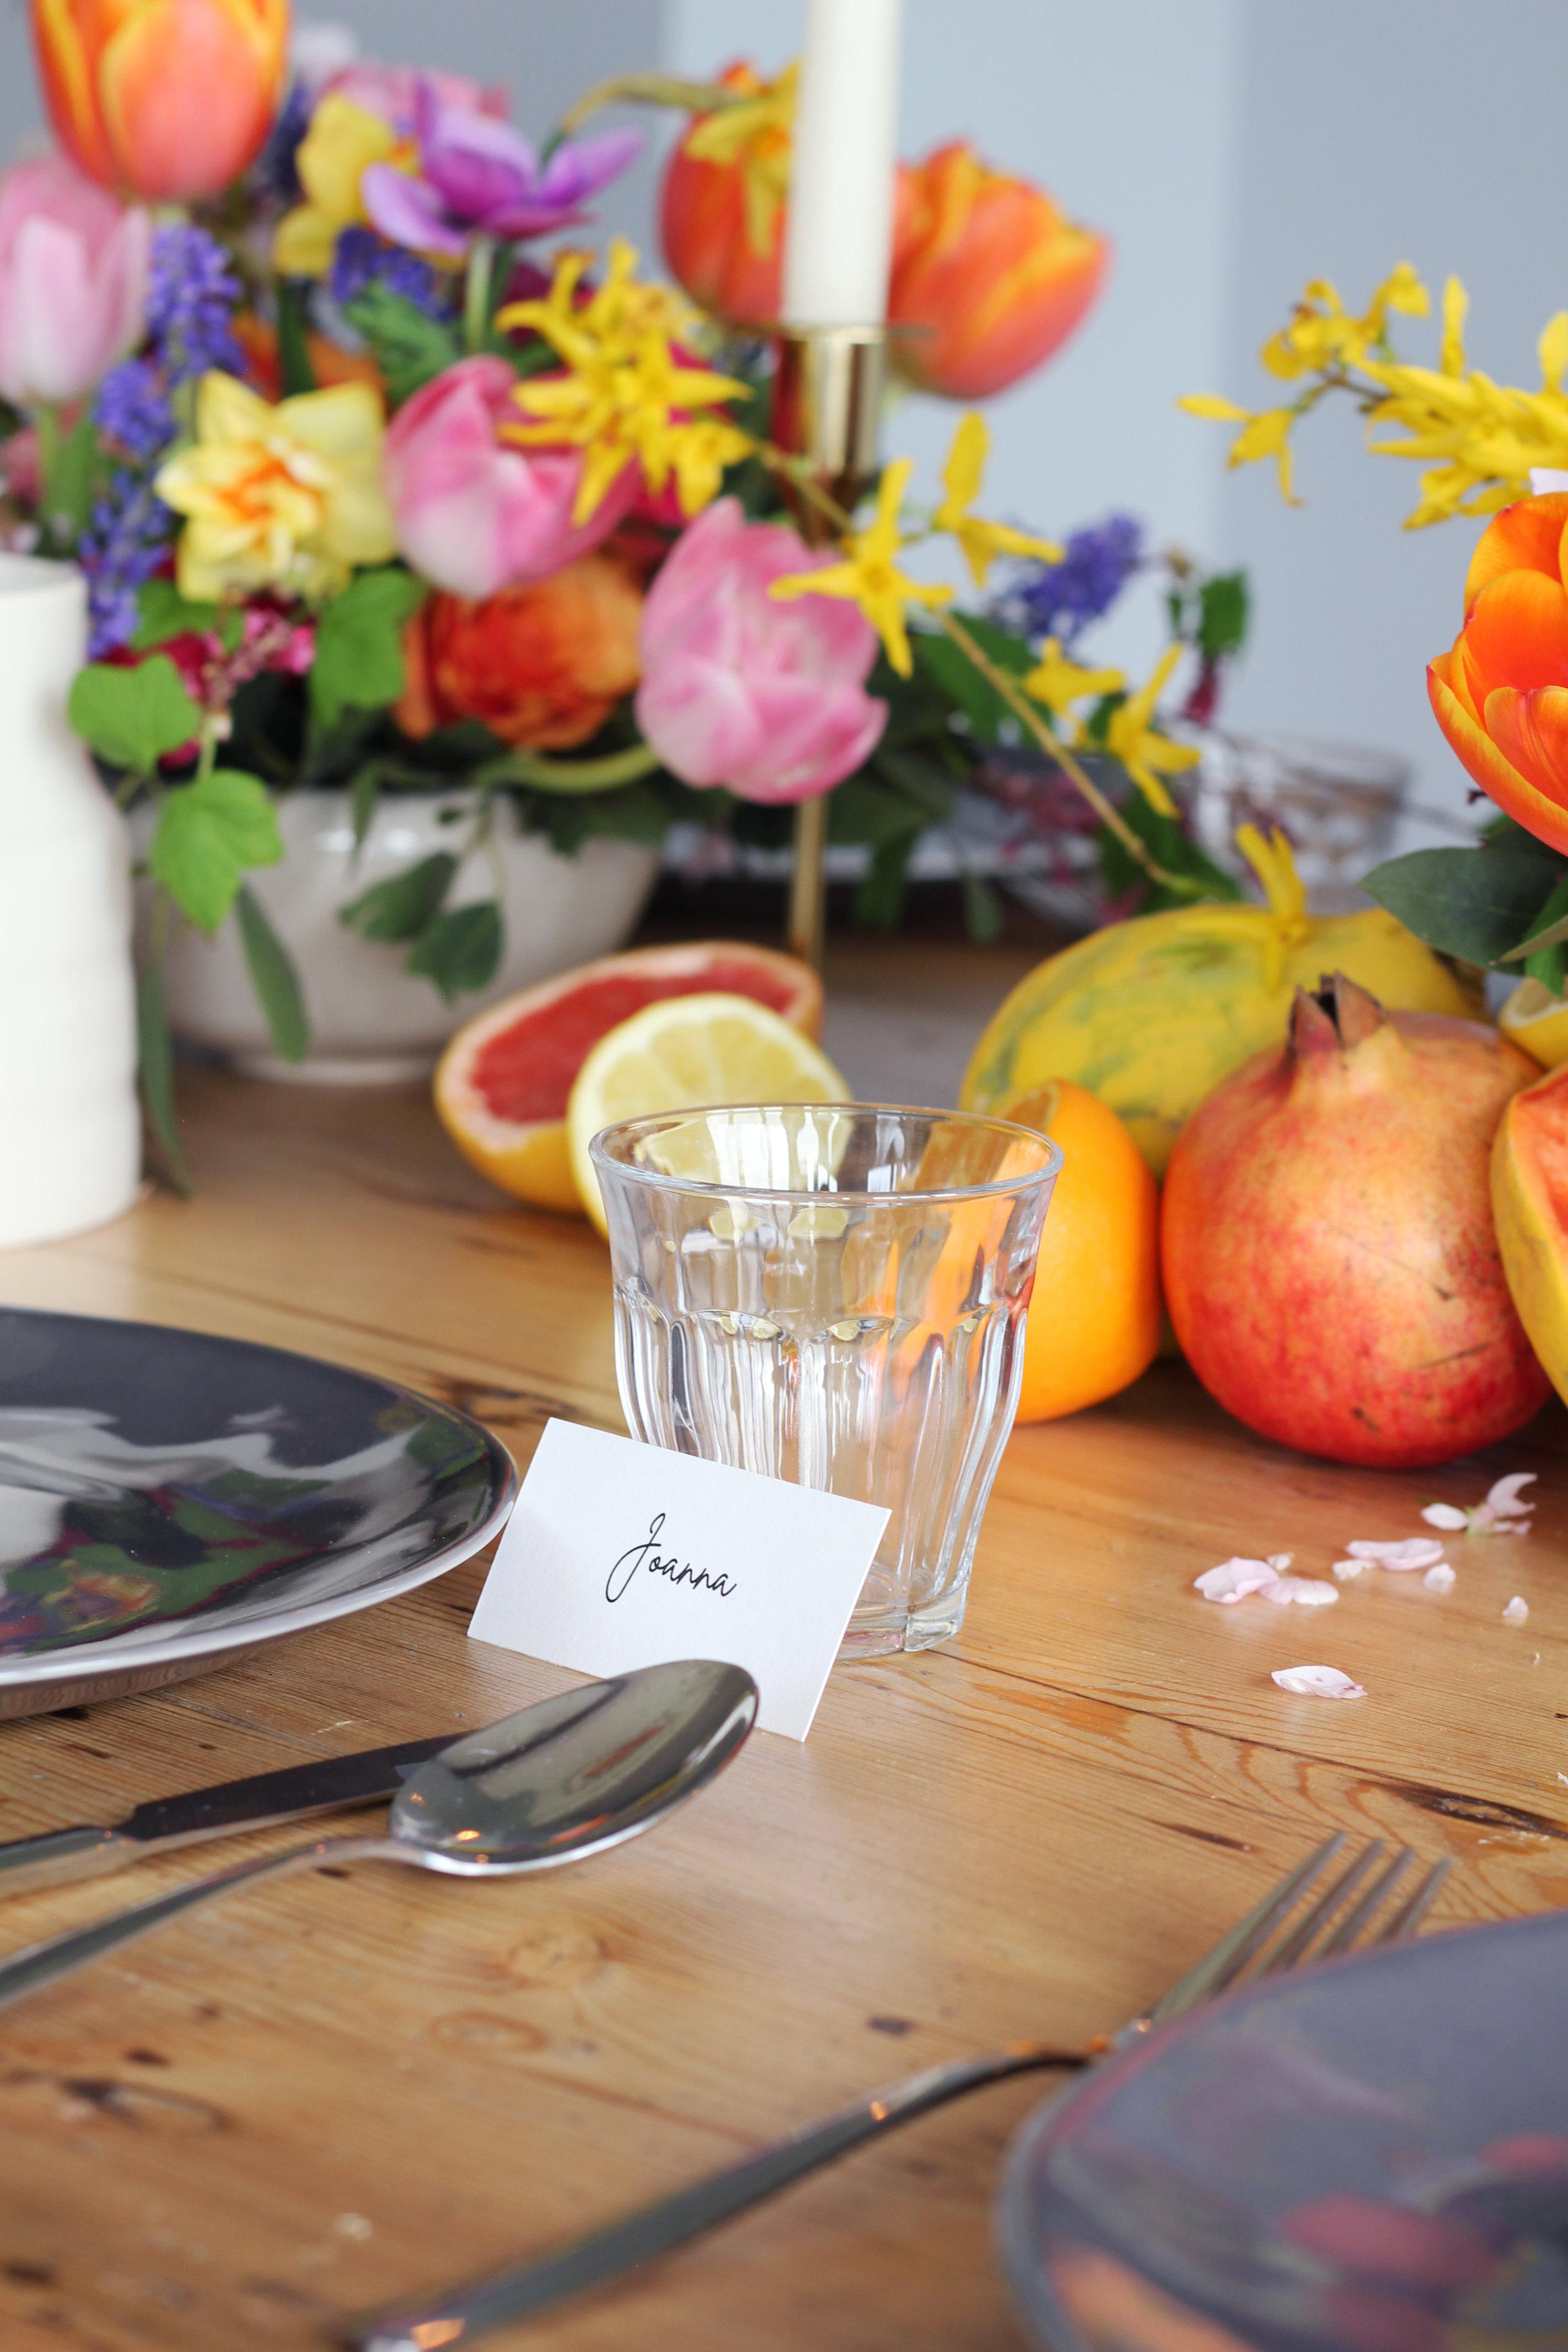 Callie-Pettigrew-Fruity-Florals-28.jpg